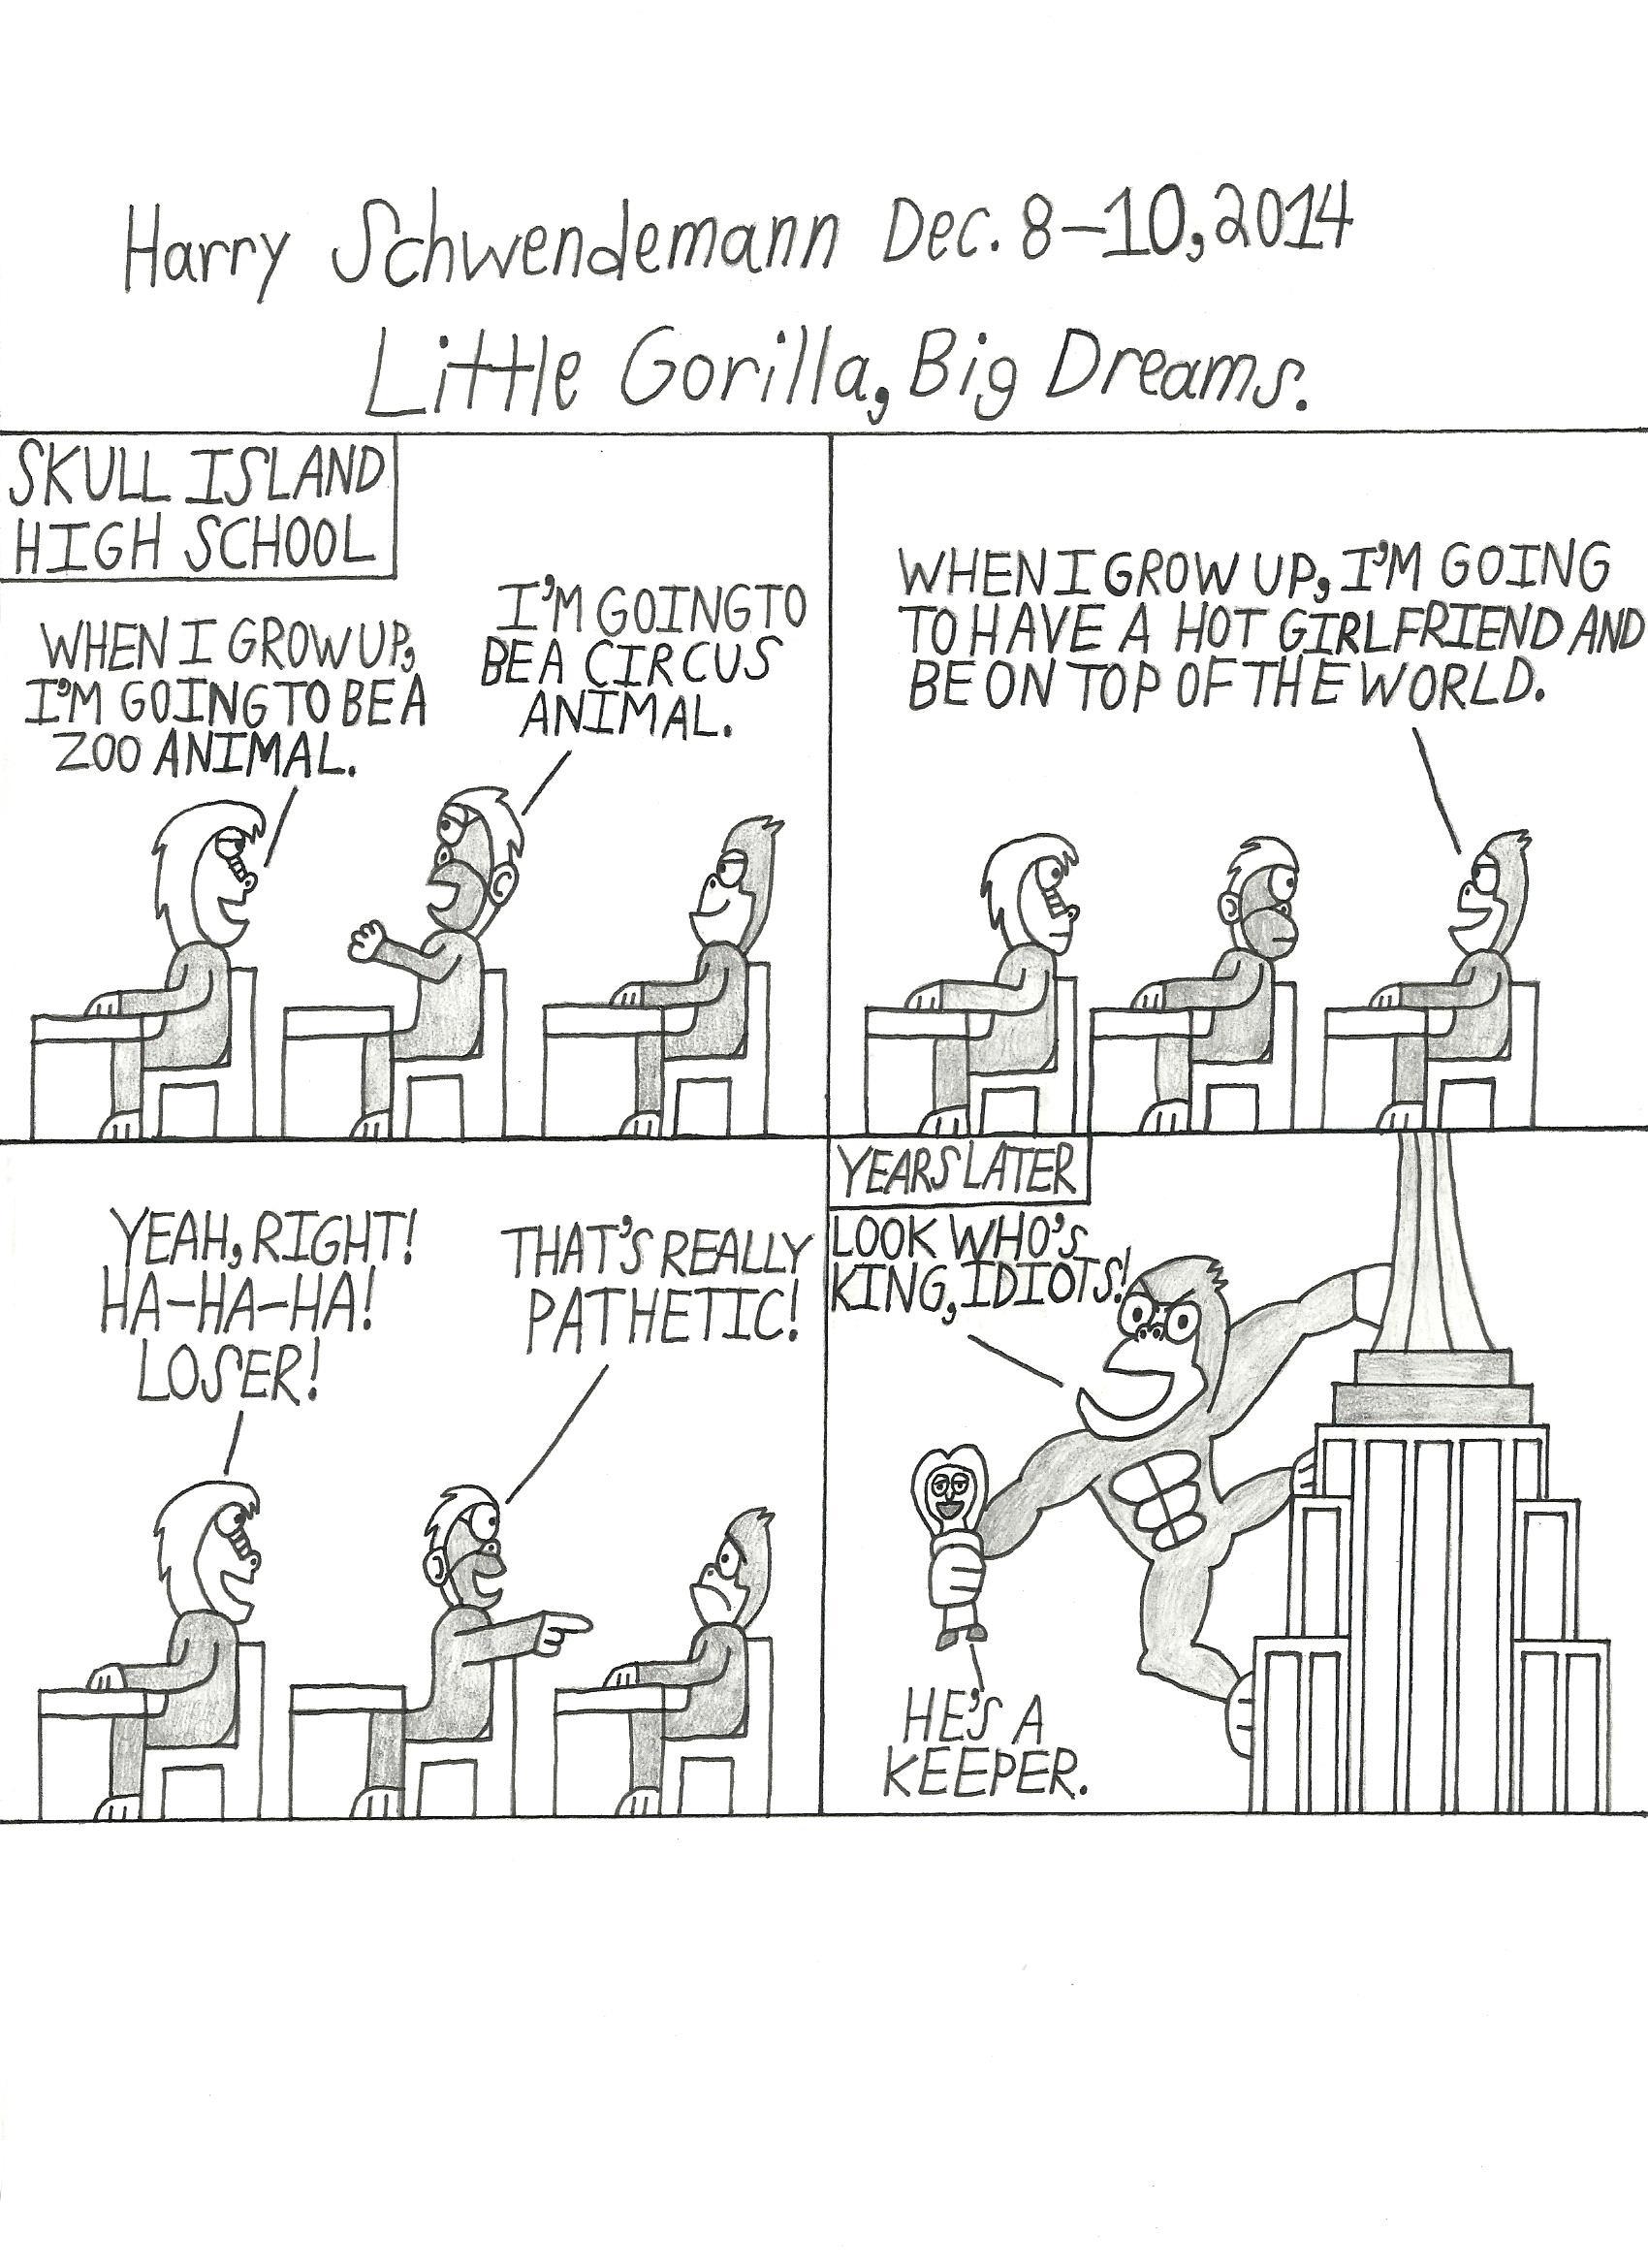 Little Gorilla, Big Dreams.